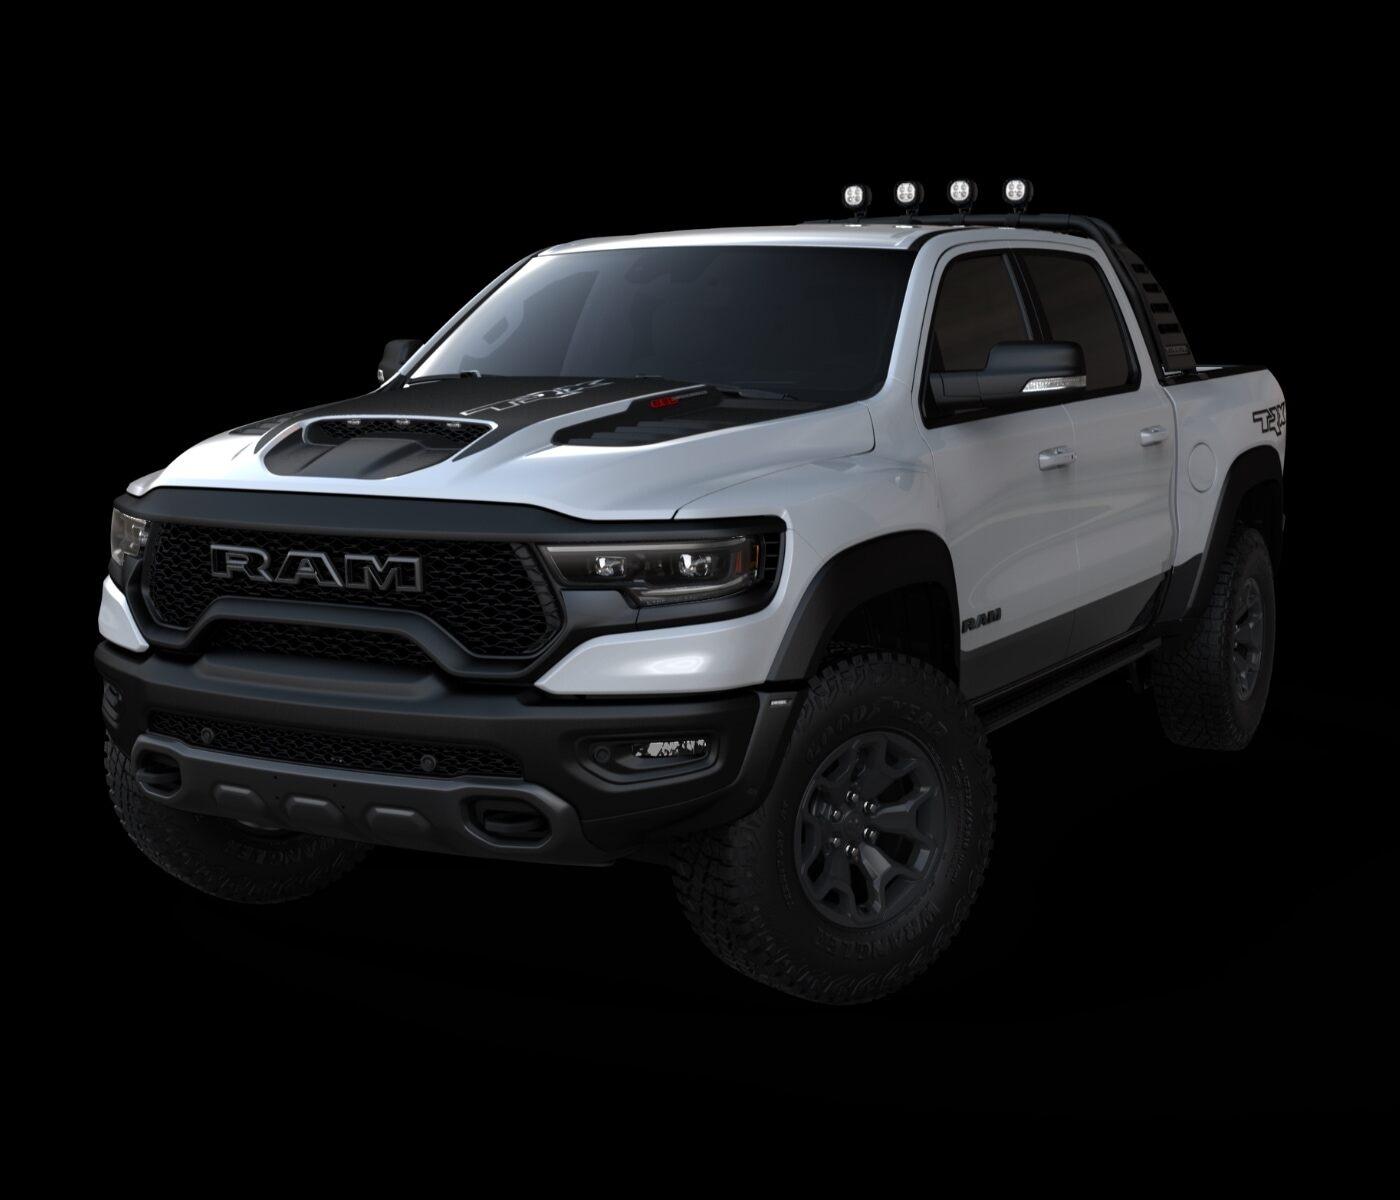 Ram 1500 Trx 2021 Camioneta Todoterreno Camionetas Ram